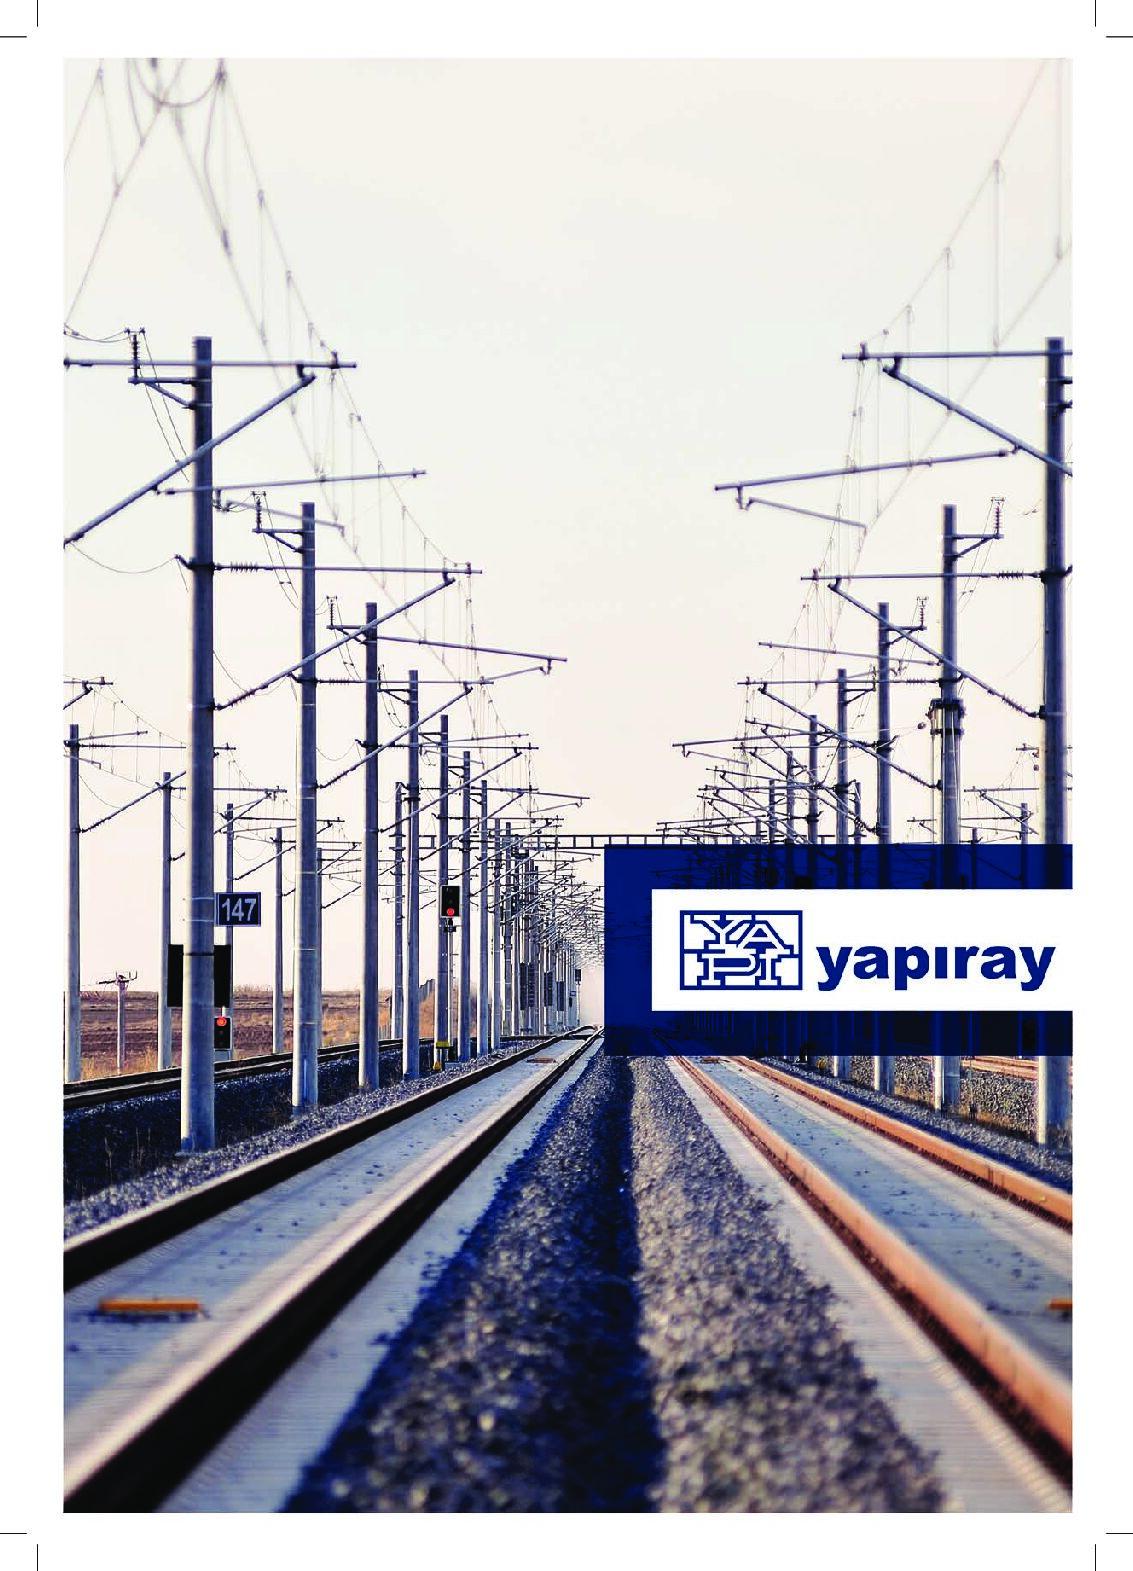 About YAPIRAY – Railway Engineering Solutions